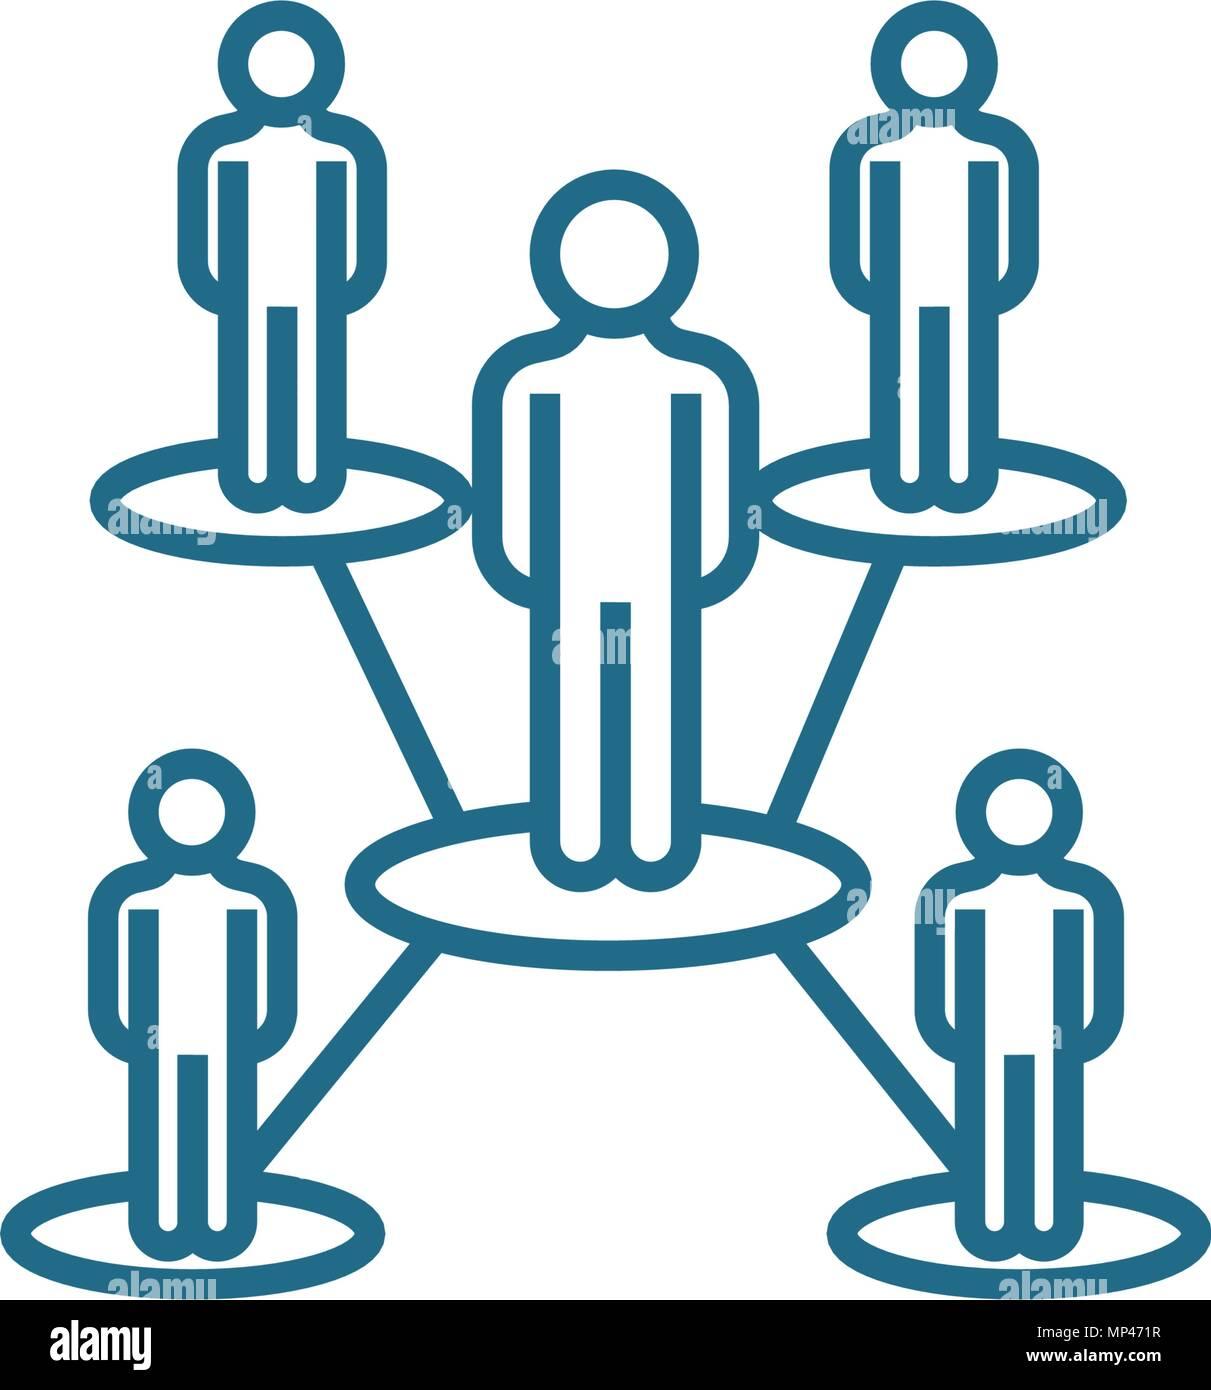 Estructura Organizativa Lineal Concepto De Icono Estructura